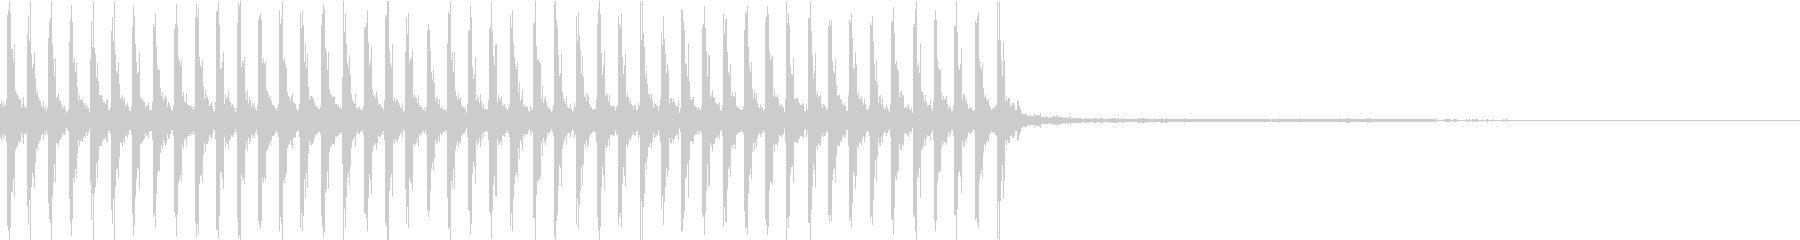 P90系サブマシンガン発砲音の未再生の波形